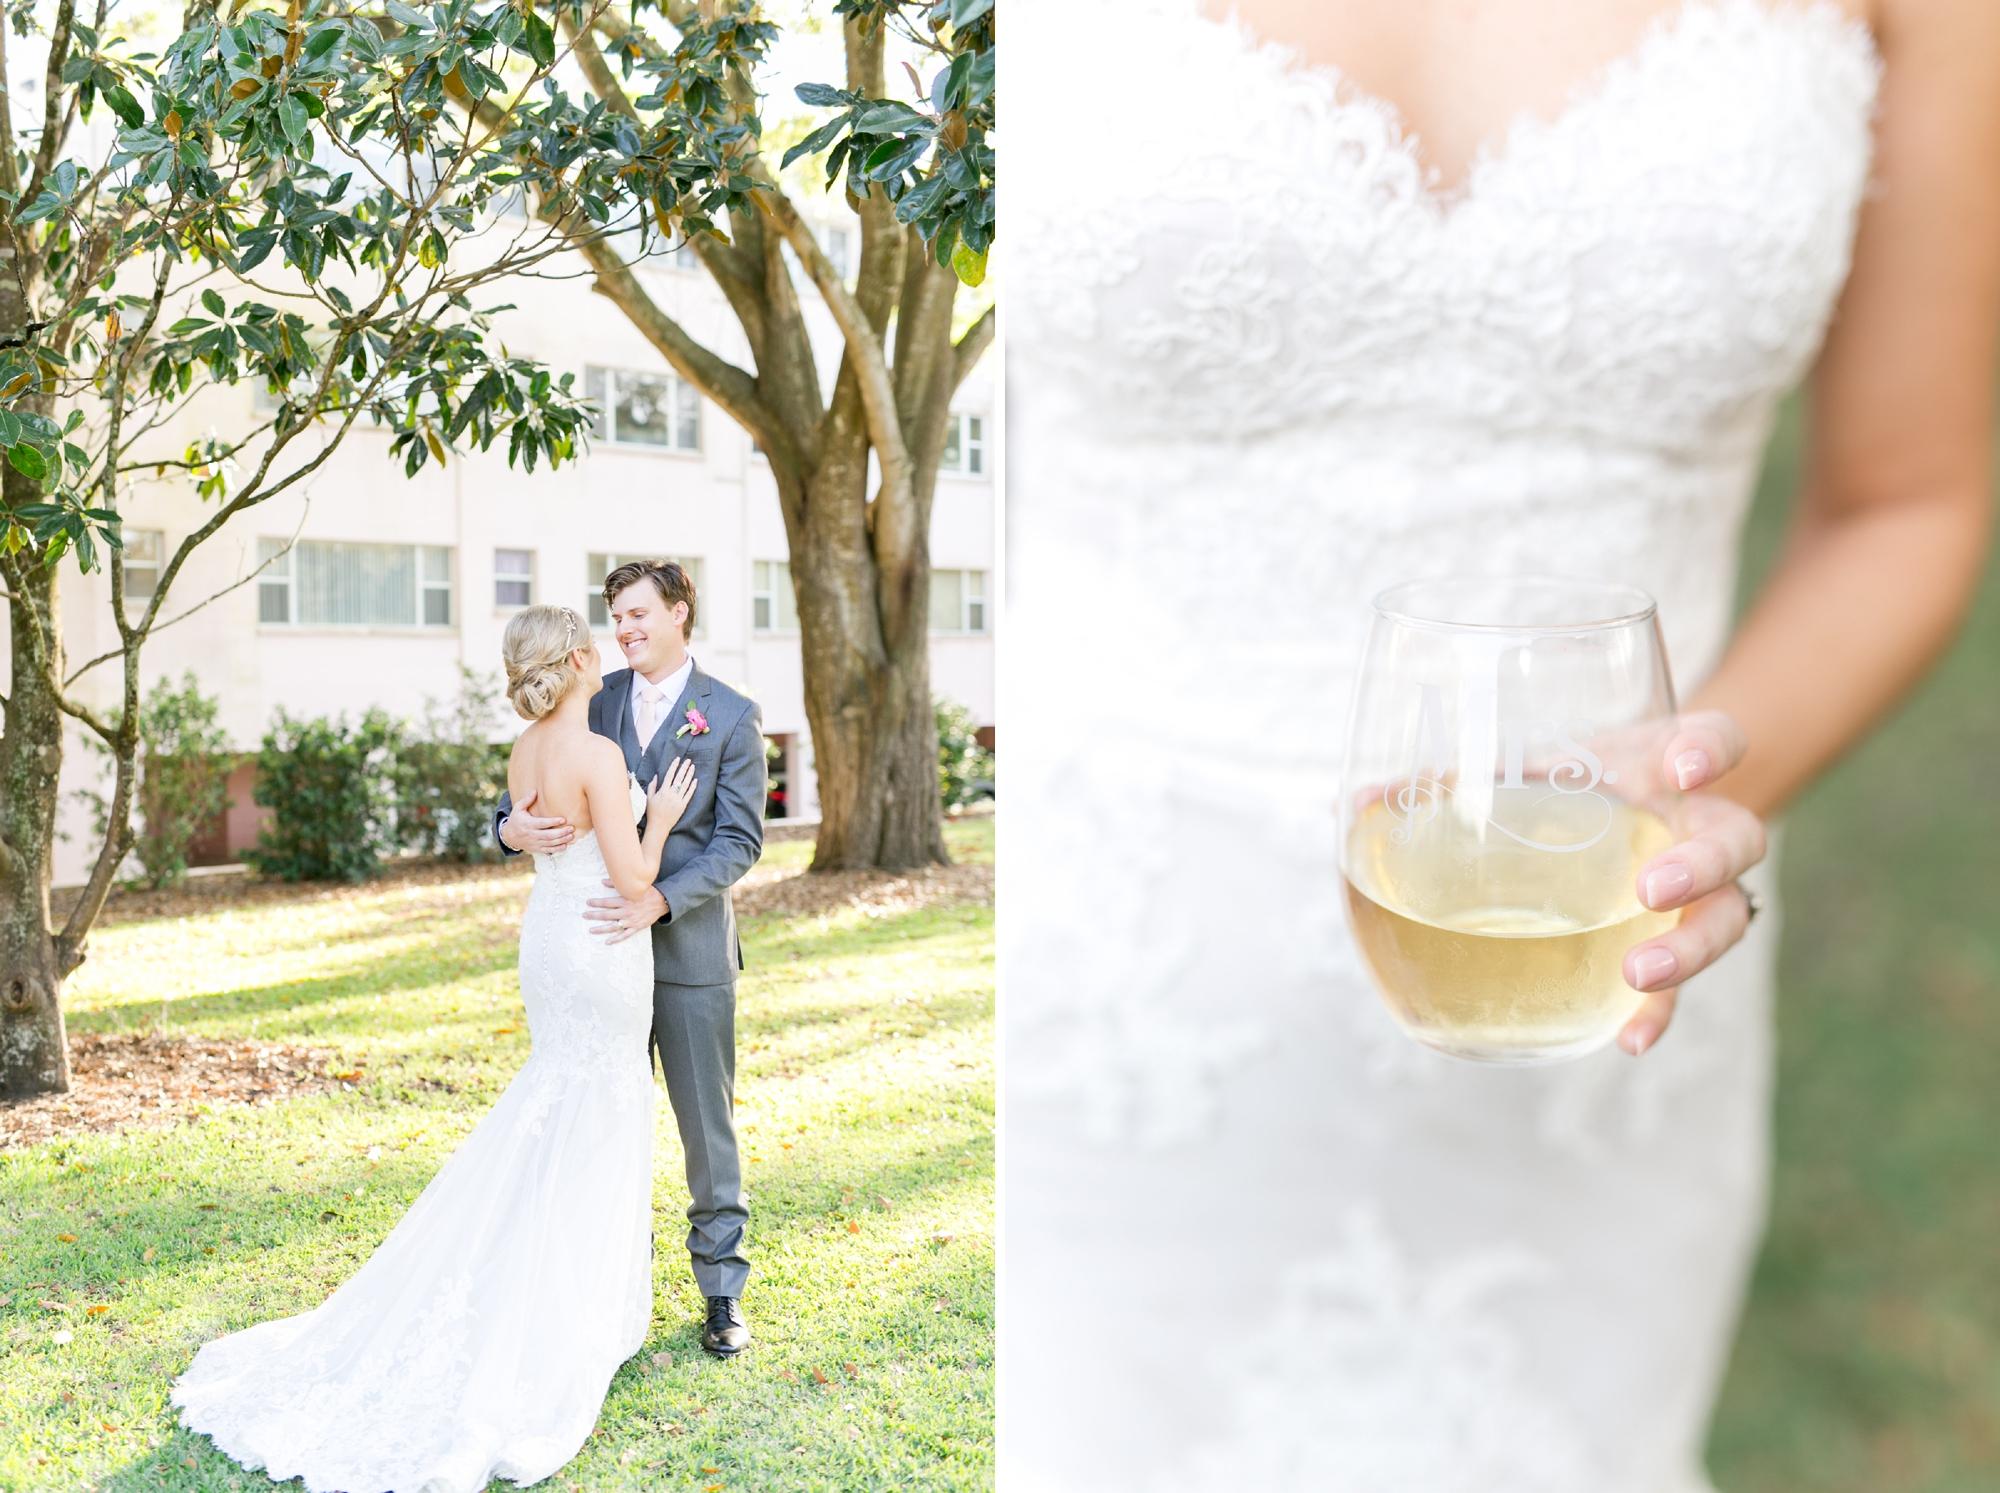 Mrs. stemless champagne glass